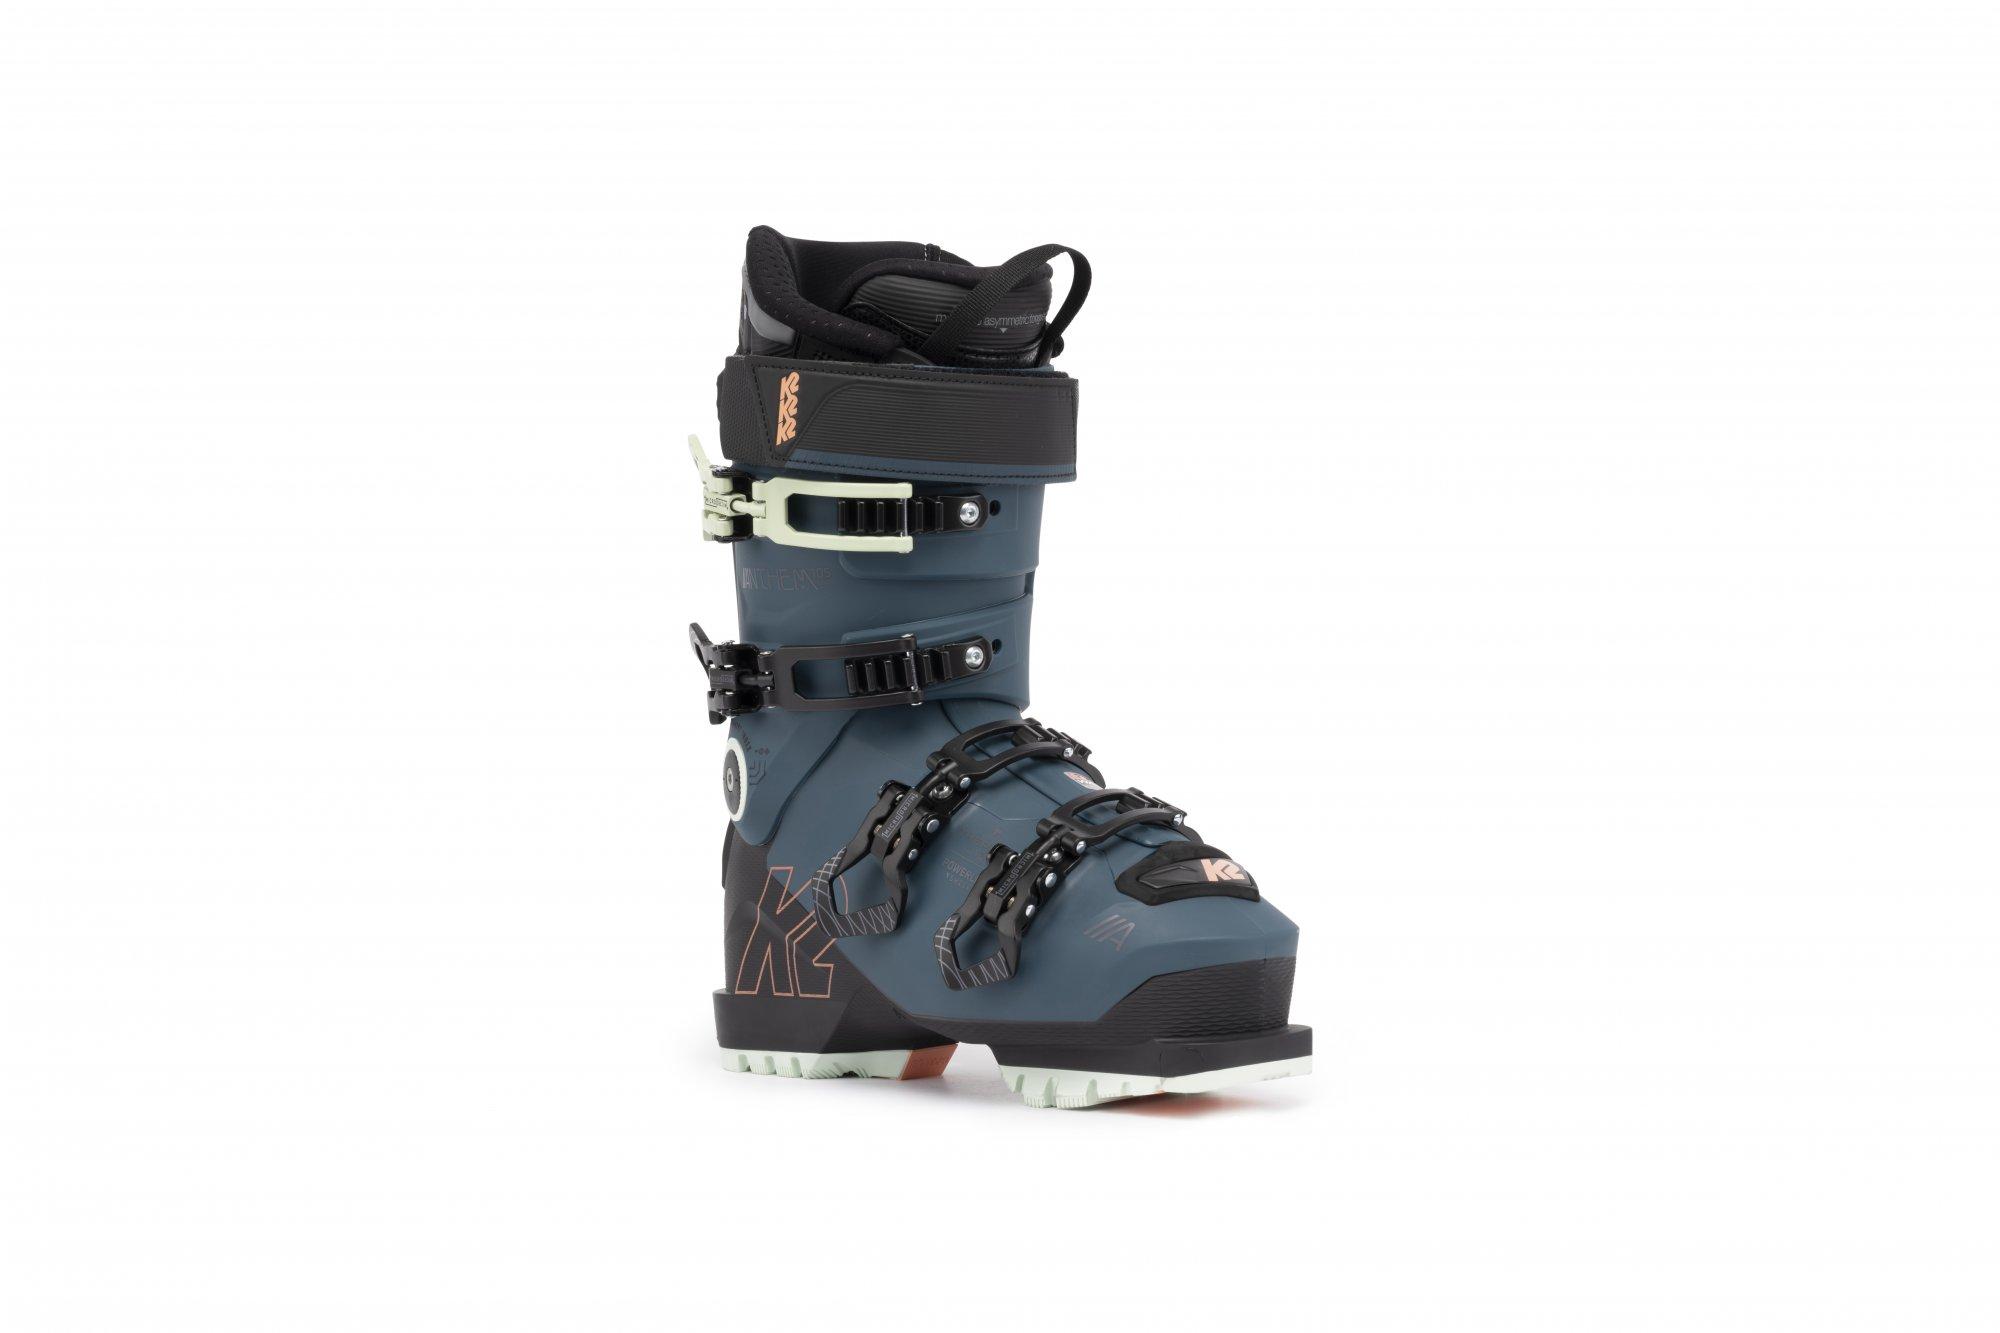 2022 K2 Anthem 105 MV Heat Gripwalk Women's Ski Boots